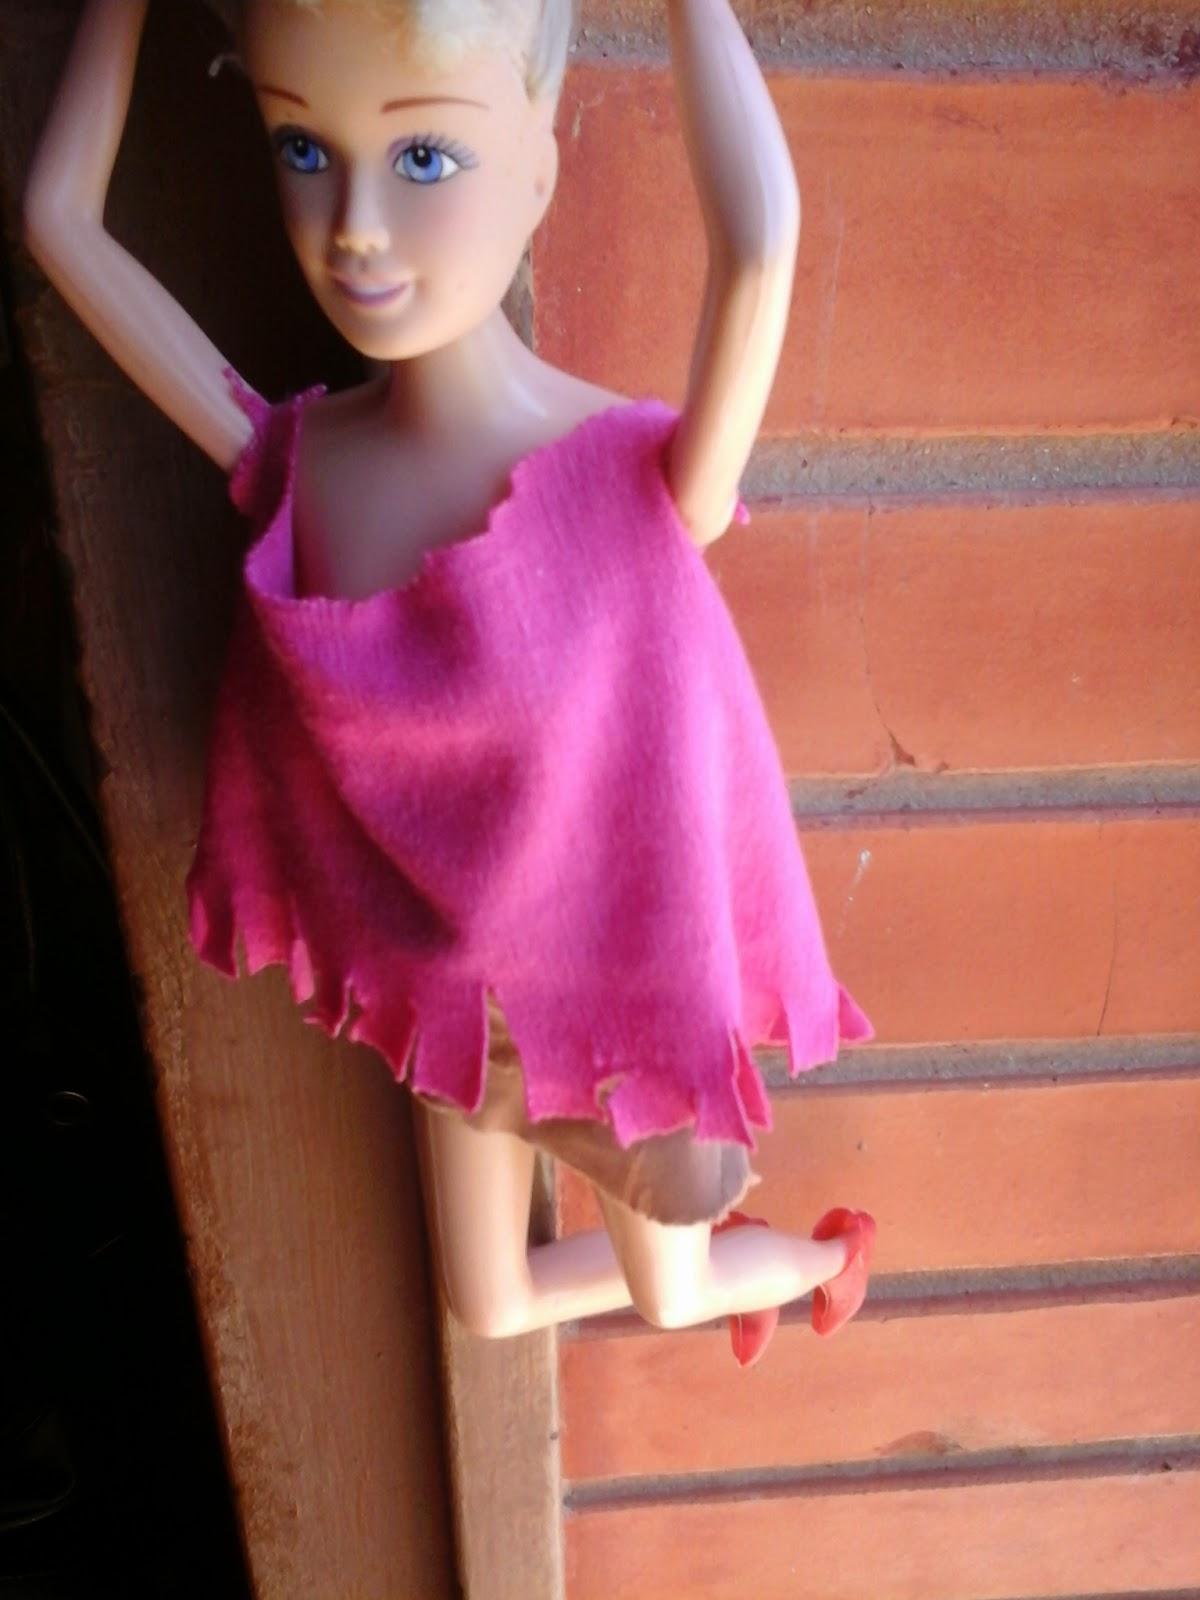 modelo pulando